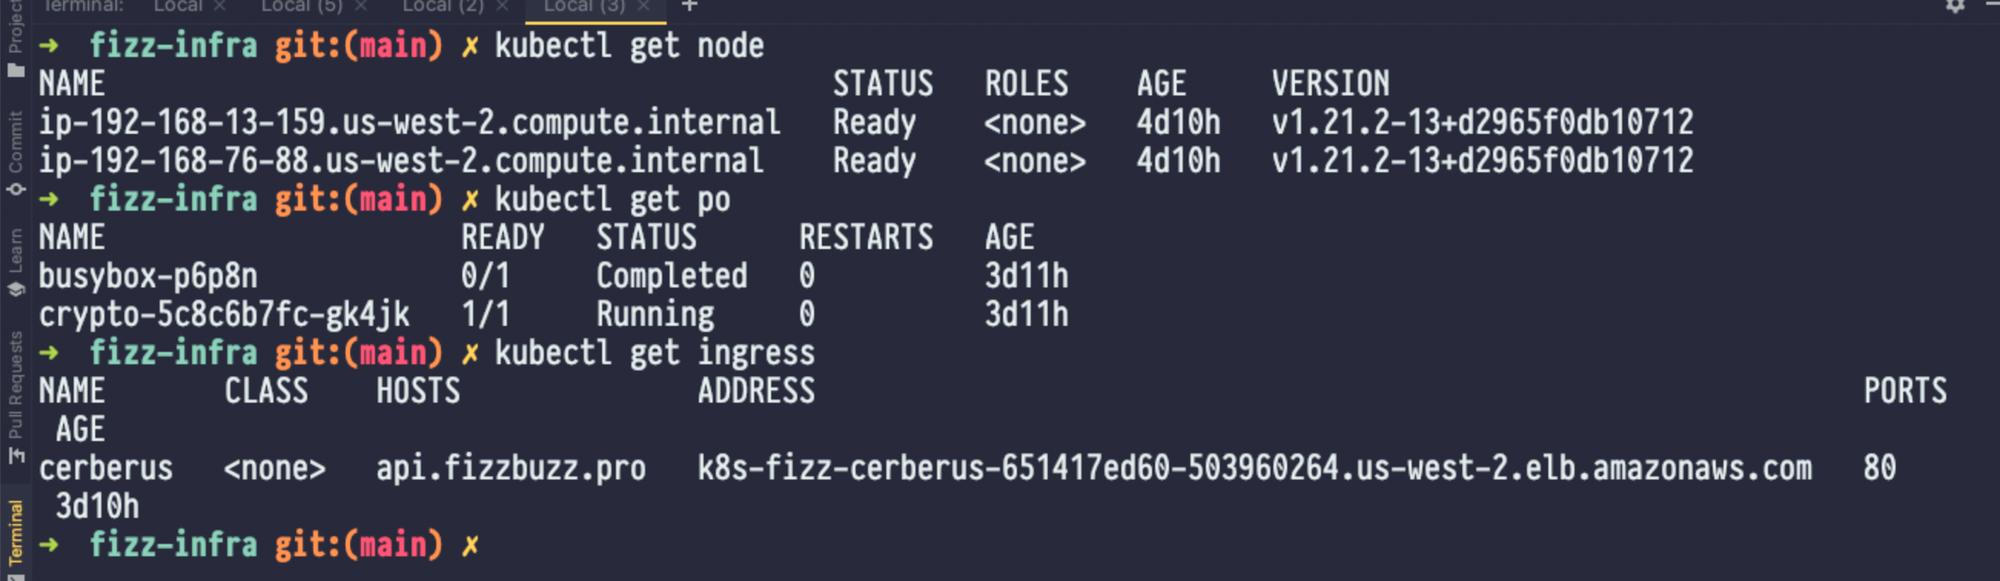 FizzBuzz Pro Kubernetes settings.